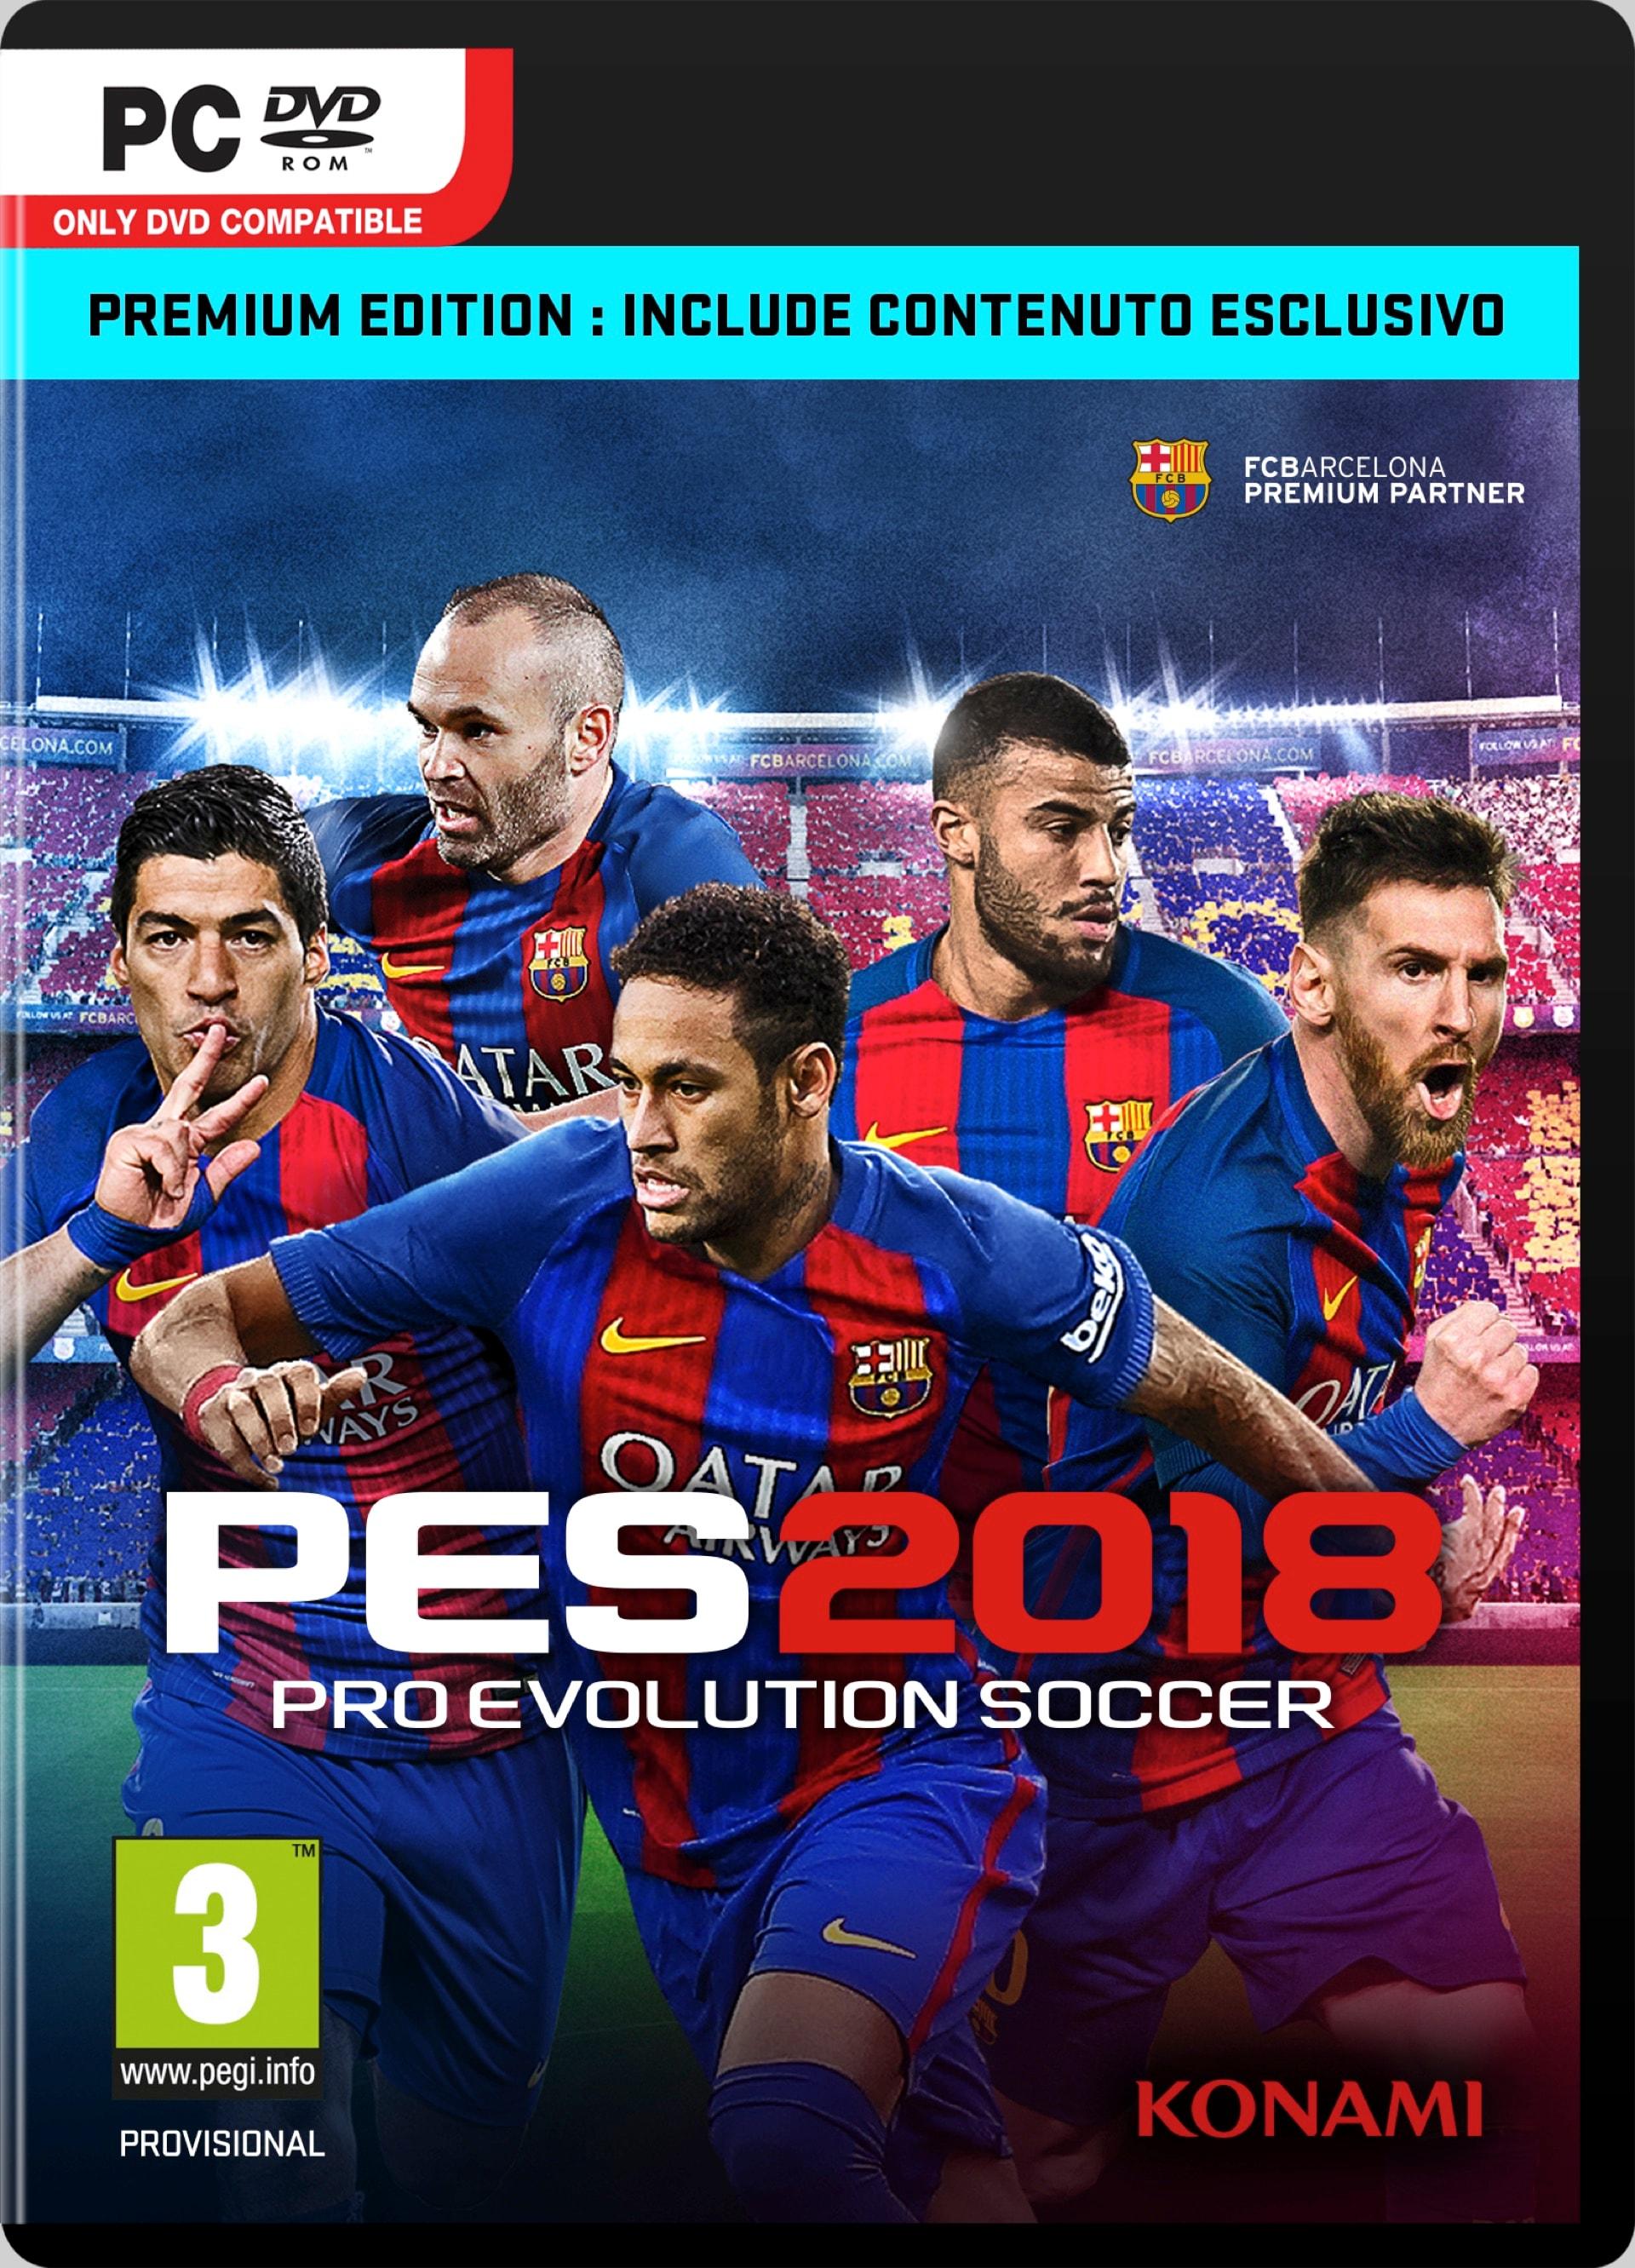 PES 2018 PC – 1